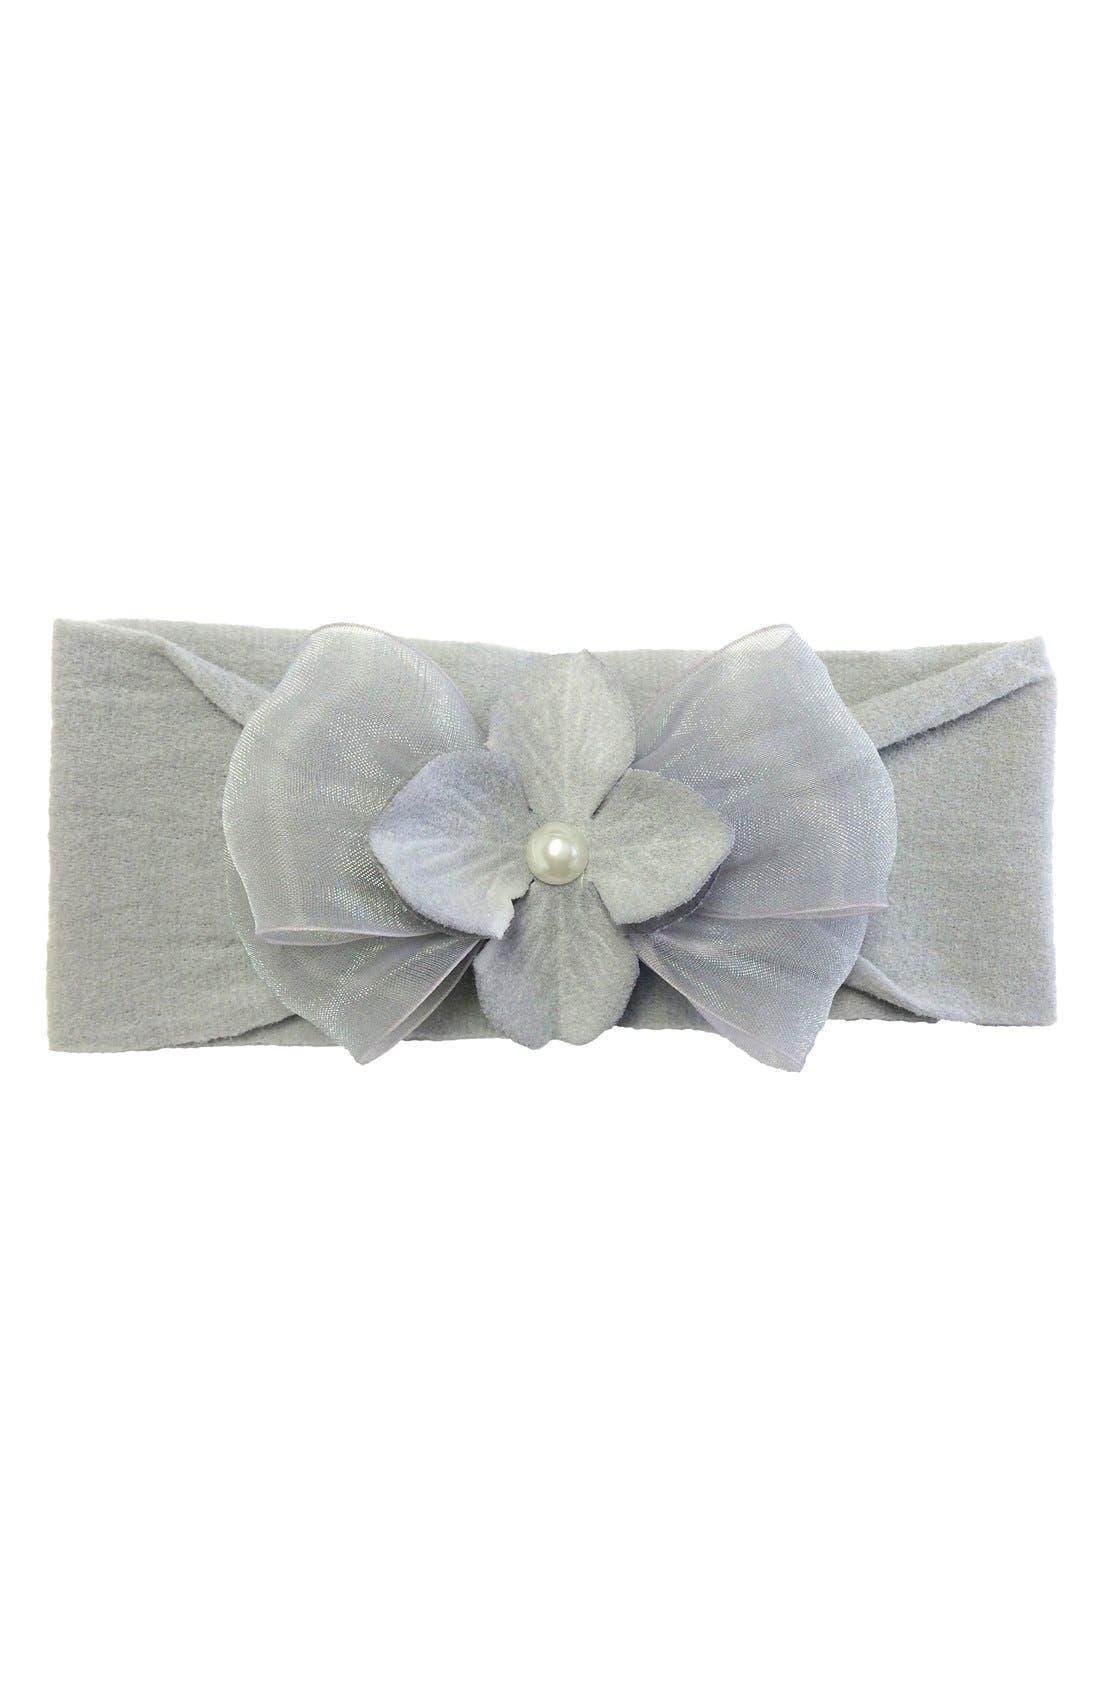 Pearly Headband,                             Main thumbnail 1, color,                             Grey/ Grey